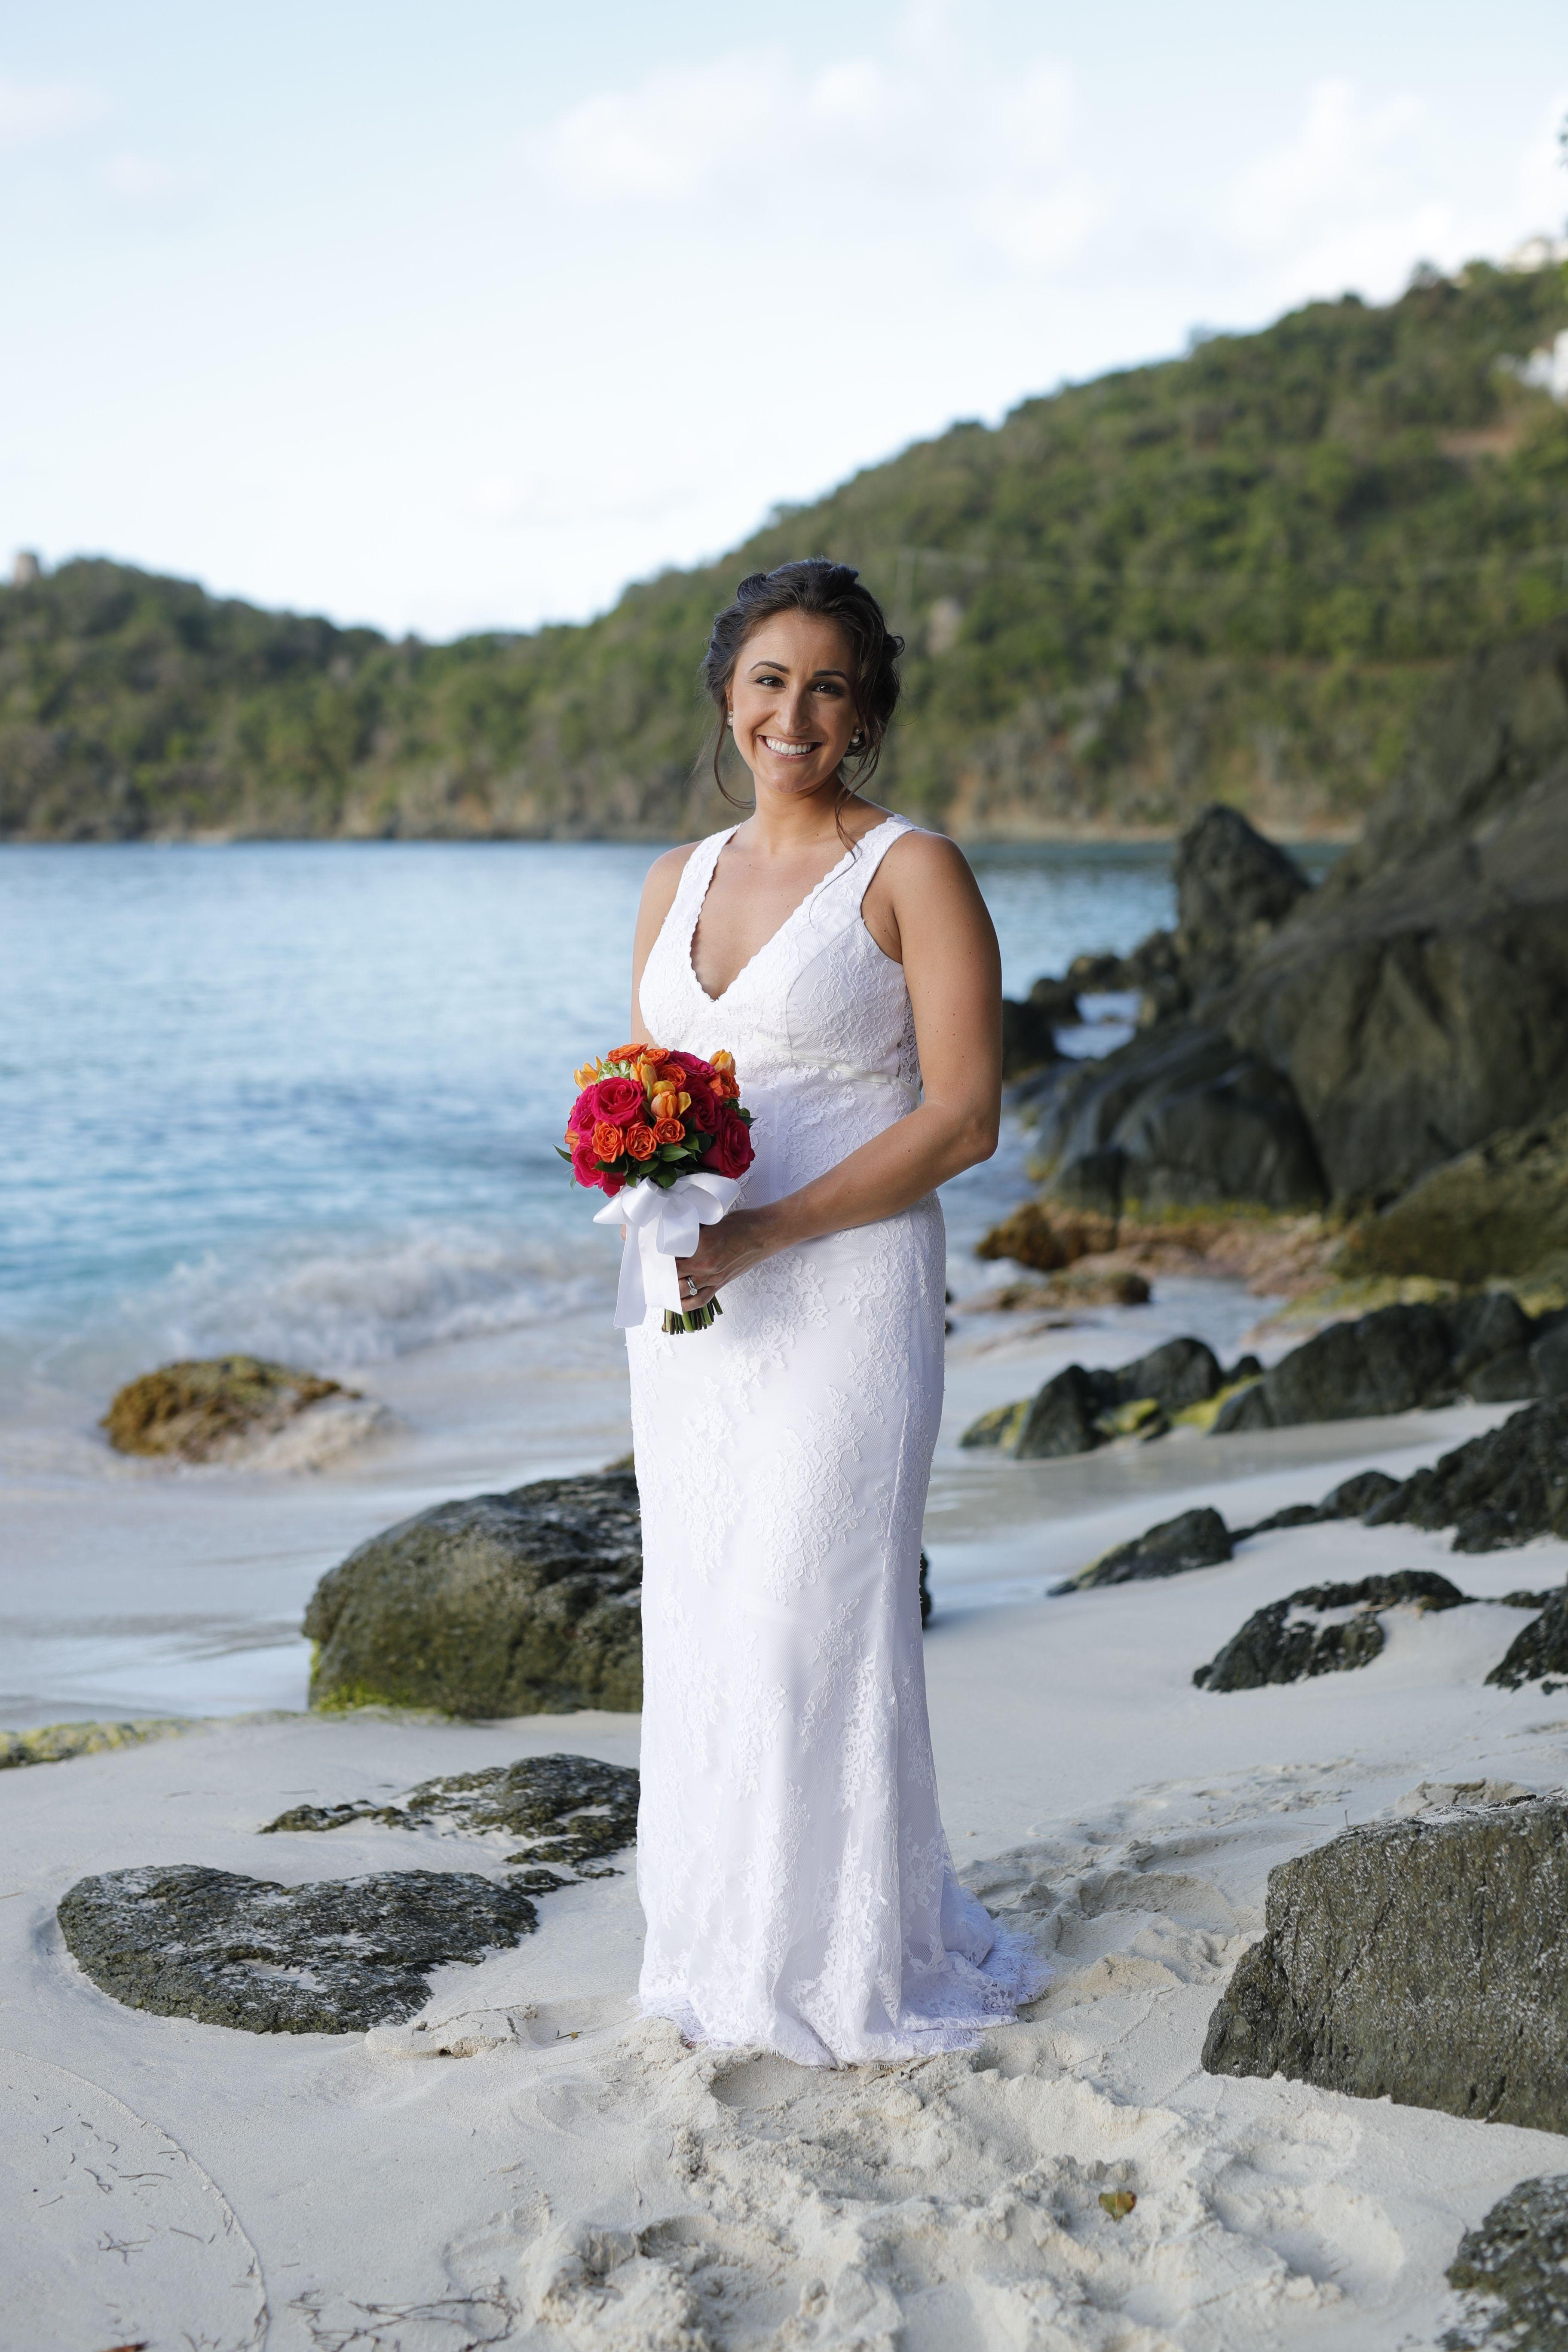 Pin by Ceremonies of St. John on Beach wedding dress